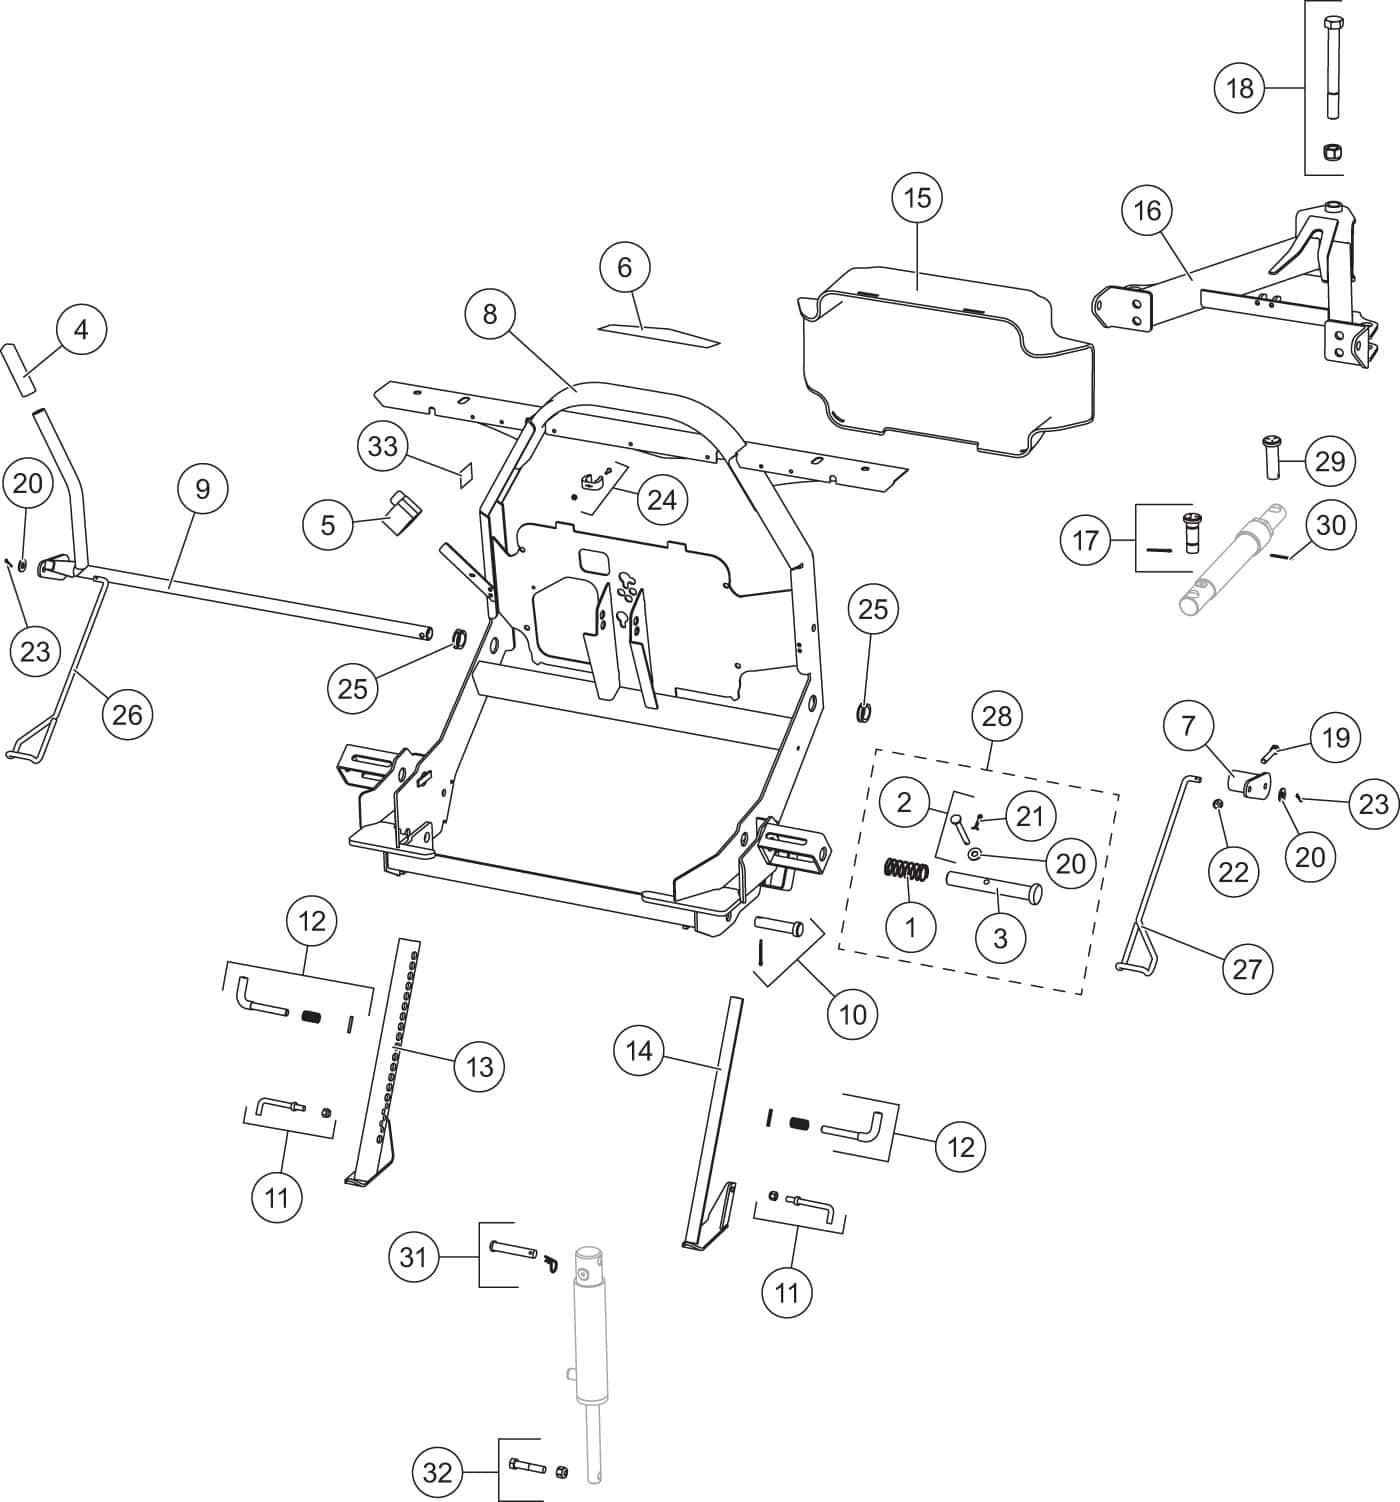 ITEParts.com: Intercon Truck Equipment Online Store on fisher parts diagram, boss snow plow solenoid diagram, fisher regulator diagram, fisher plow diagram, fisher plow solenoid wiring,